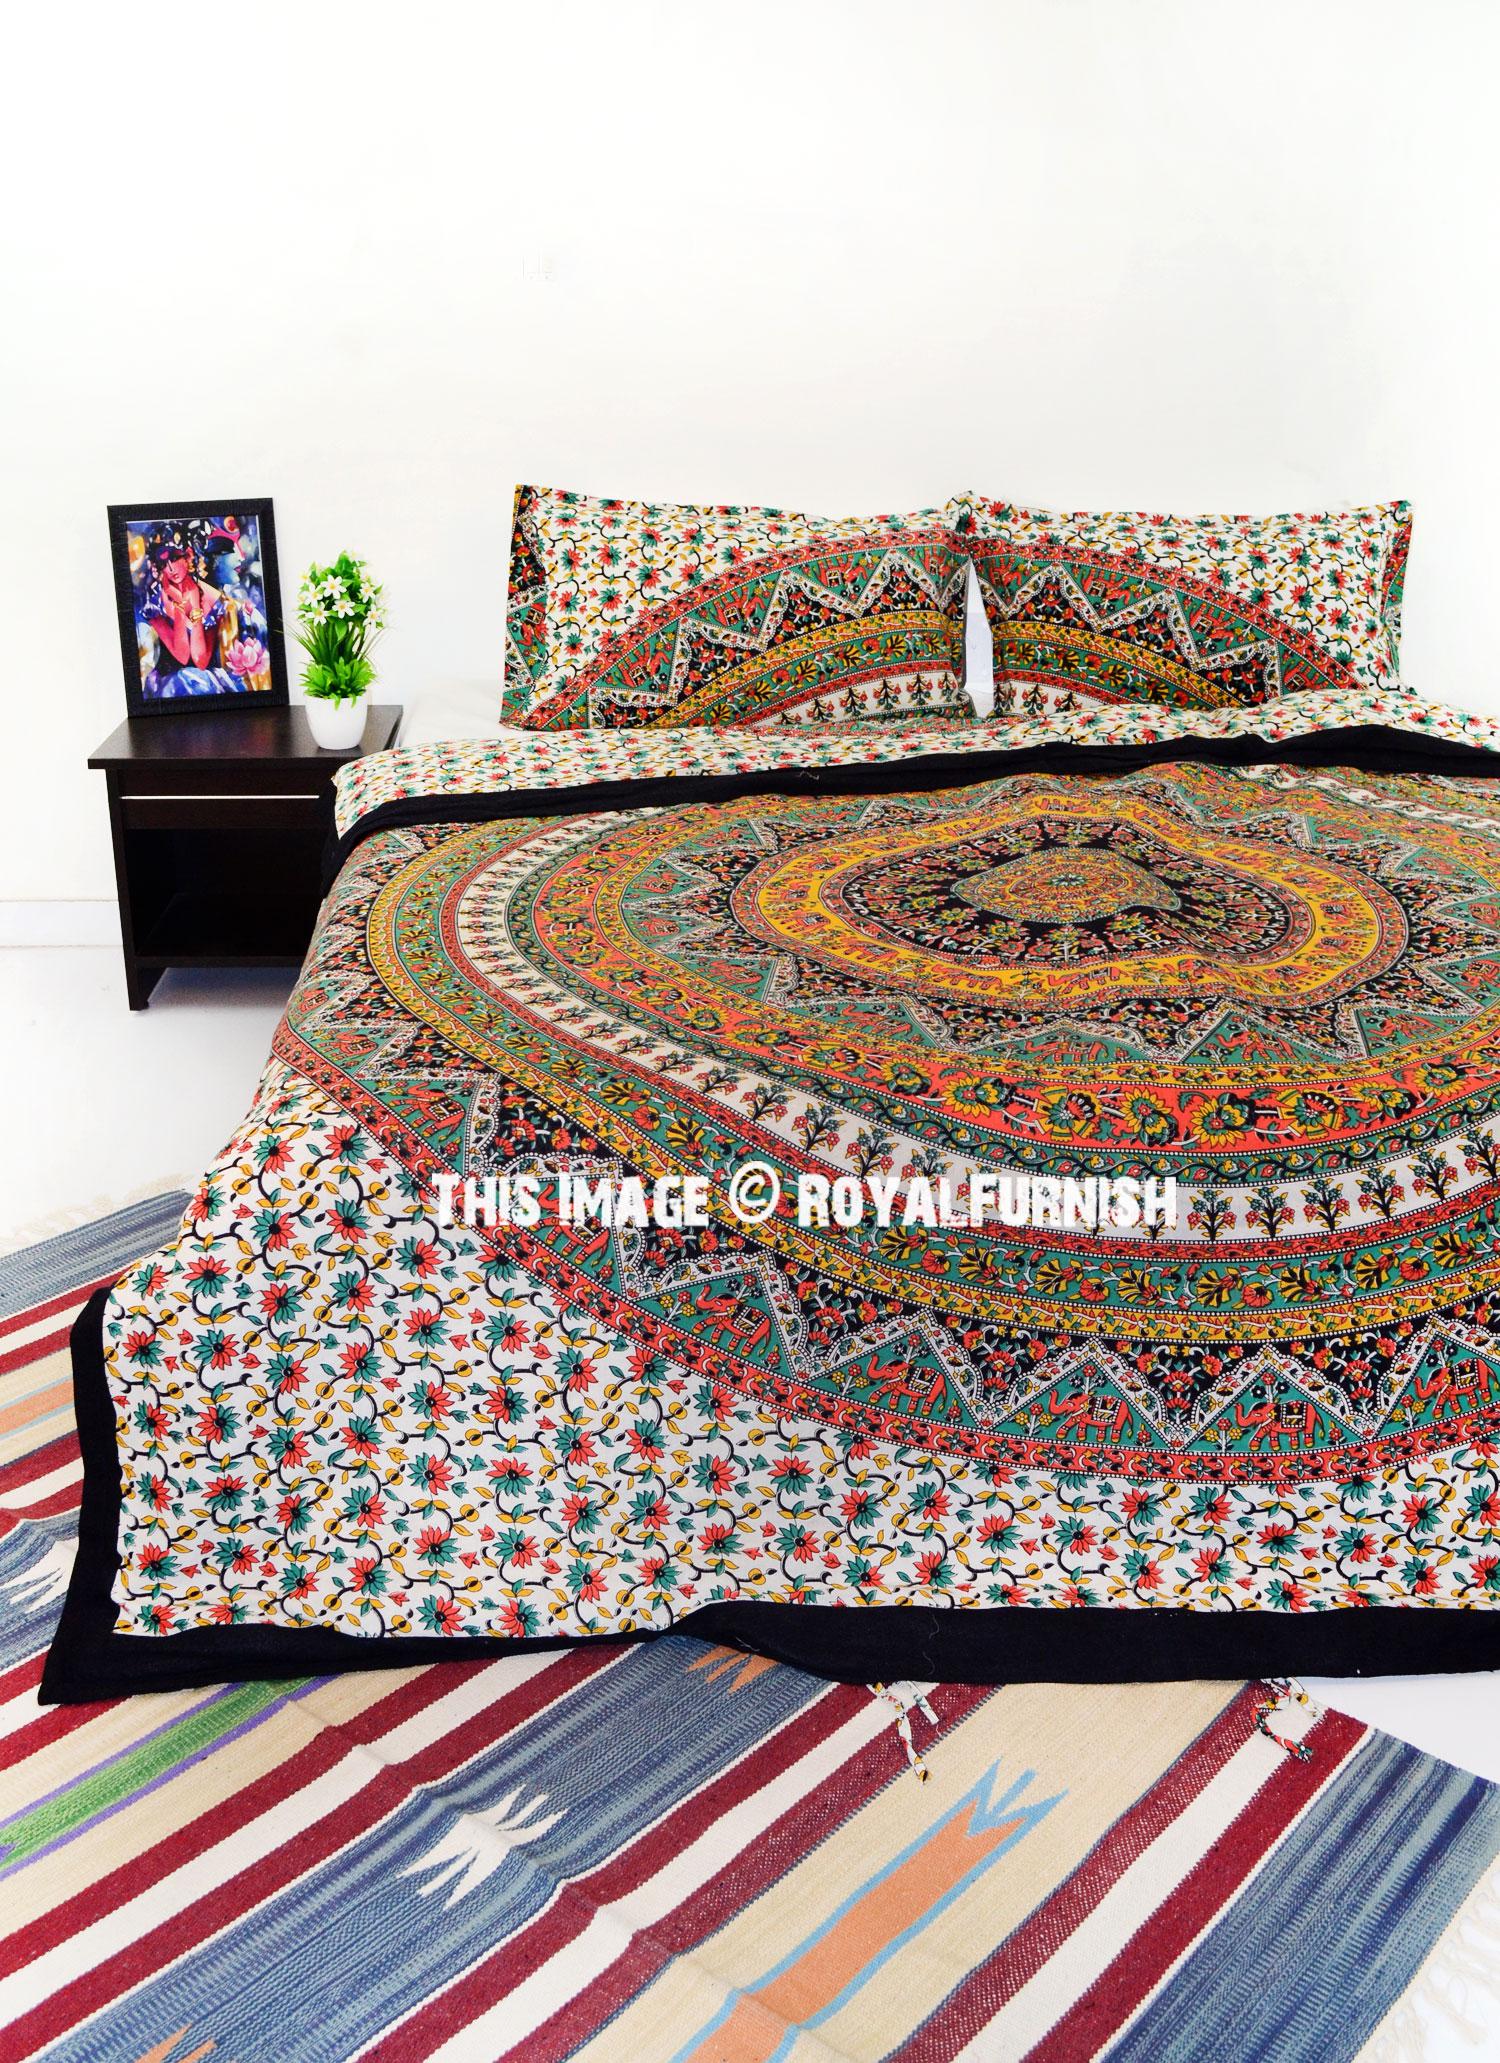 Multi Kerala Bohemian Hippie Bedding Duvet Covers Set with 2 Pillow Covers  RoyalFurnishcom